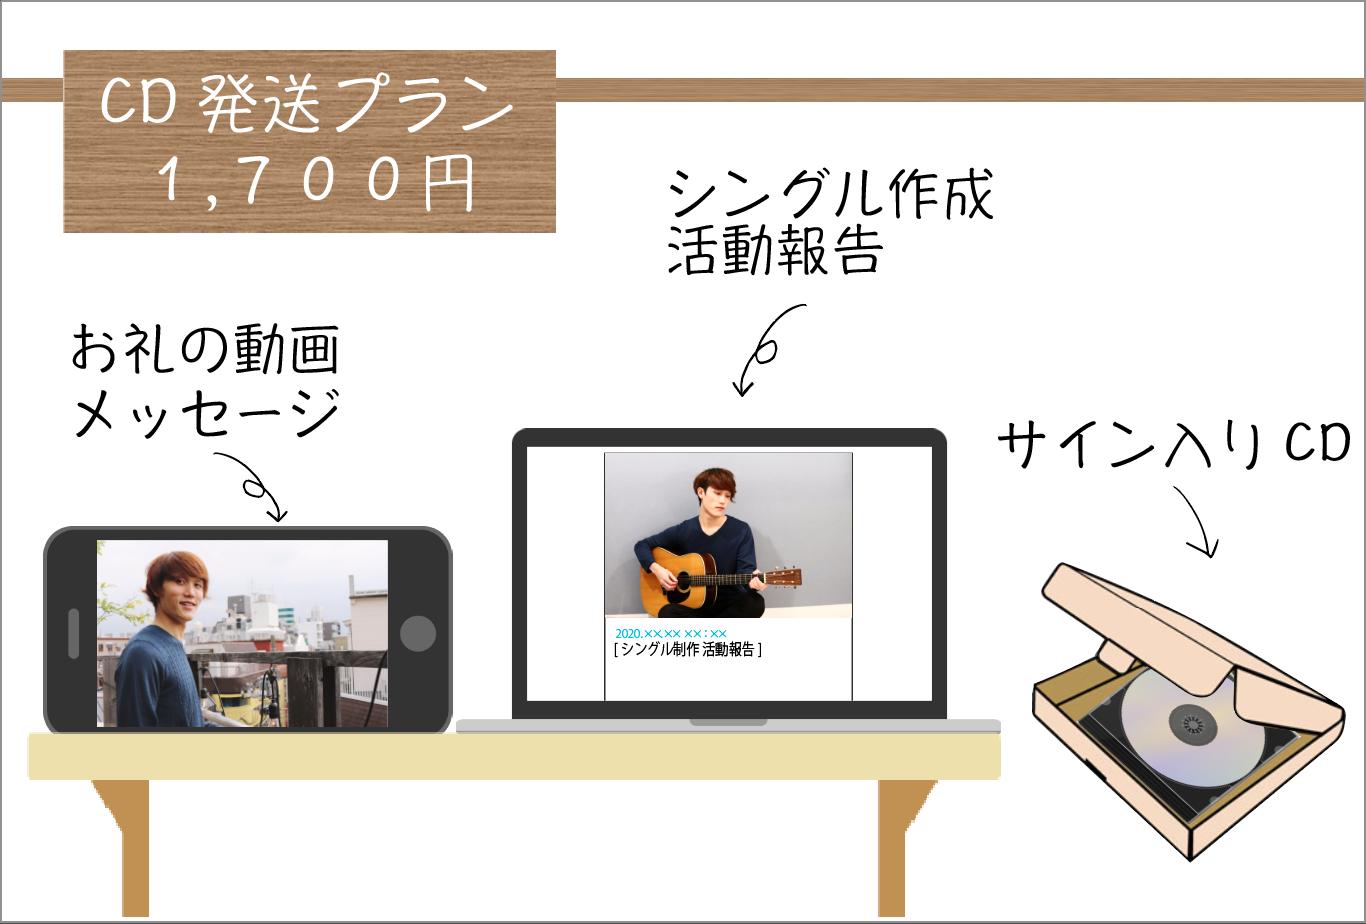 <CD発送 プラン>